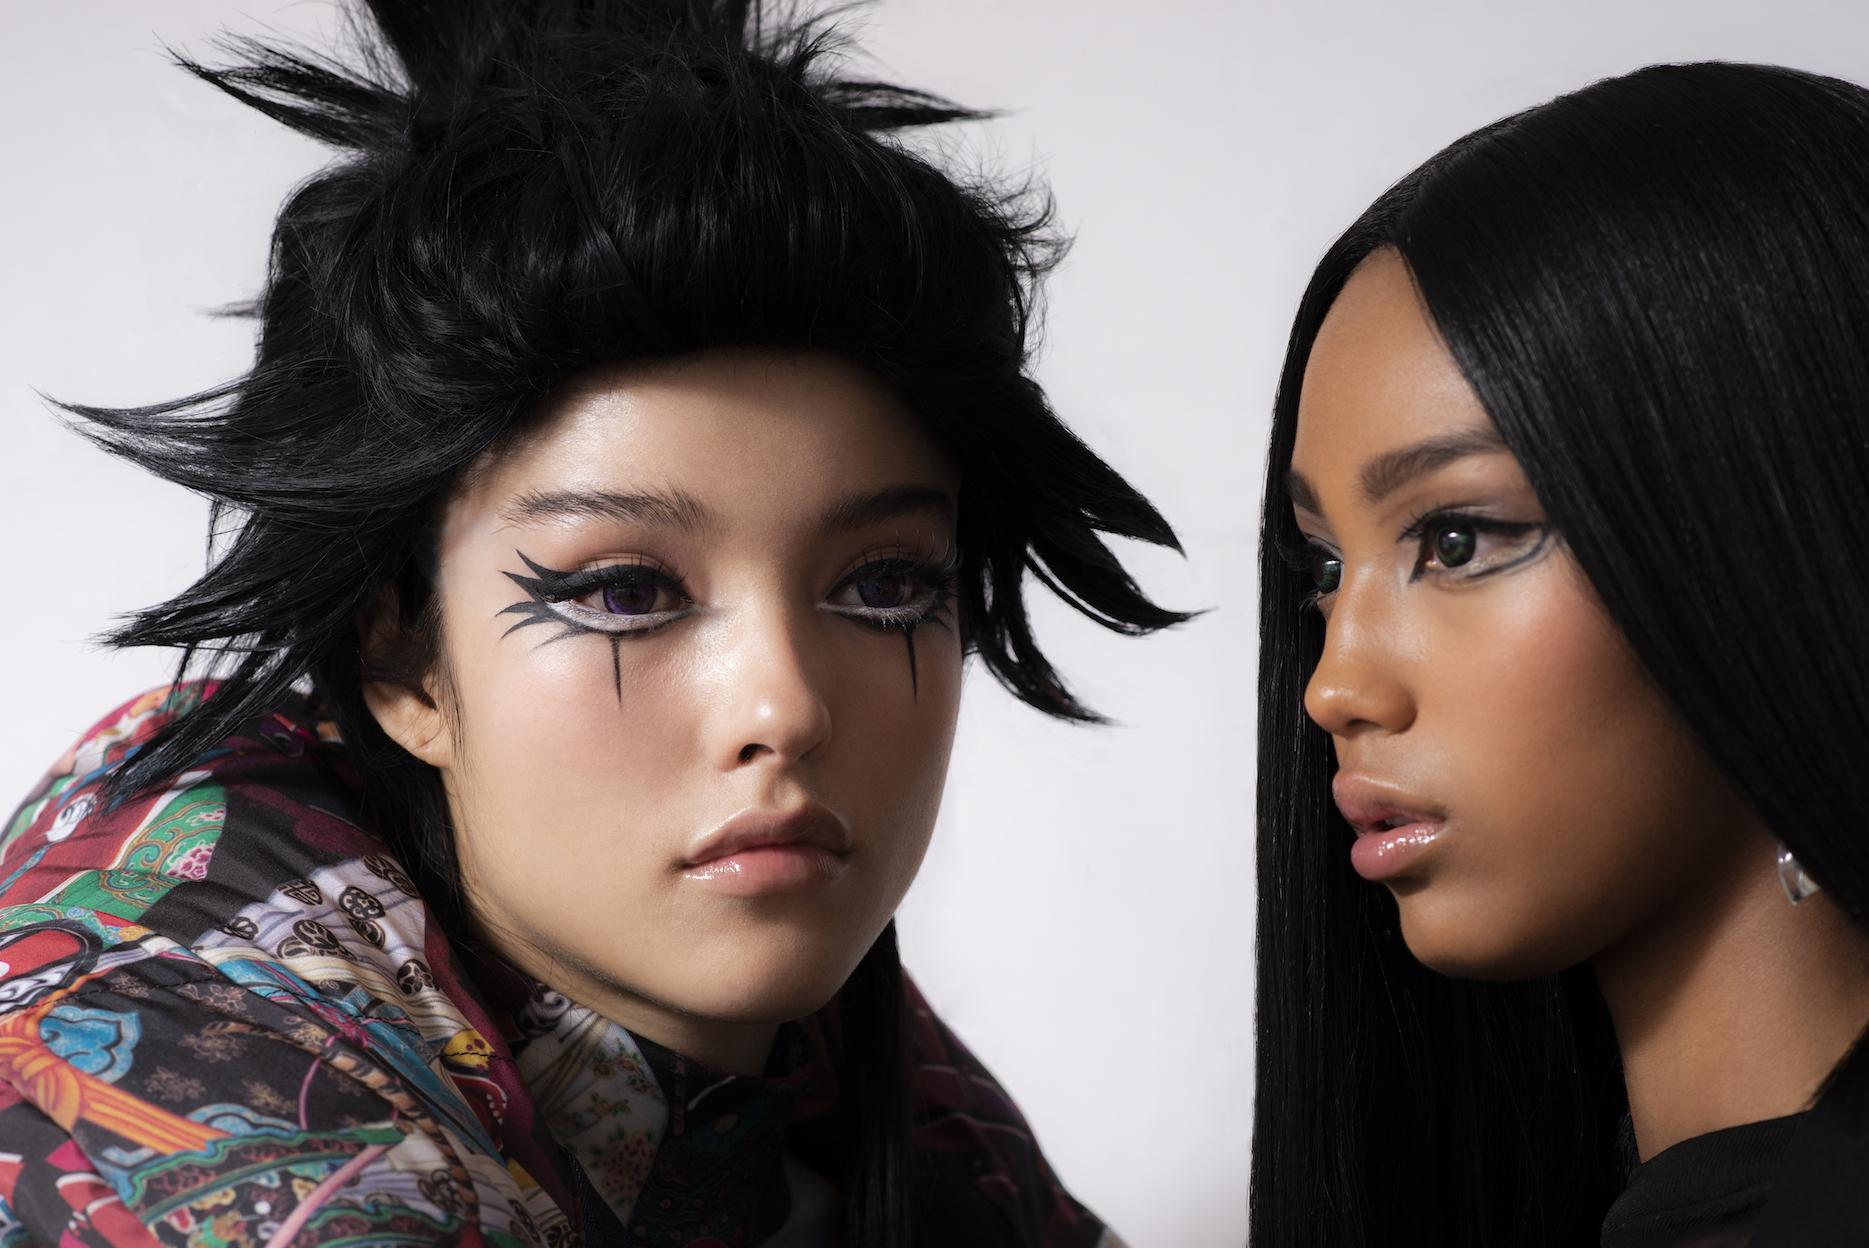 makeup by @anagdv